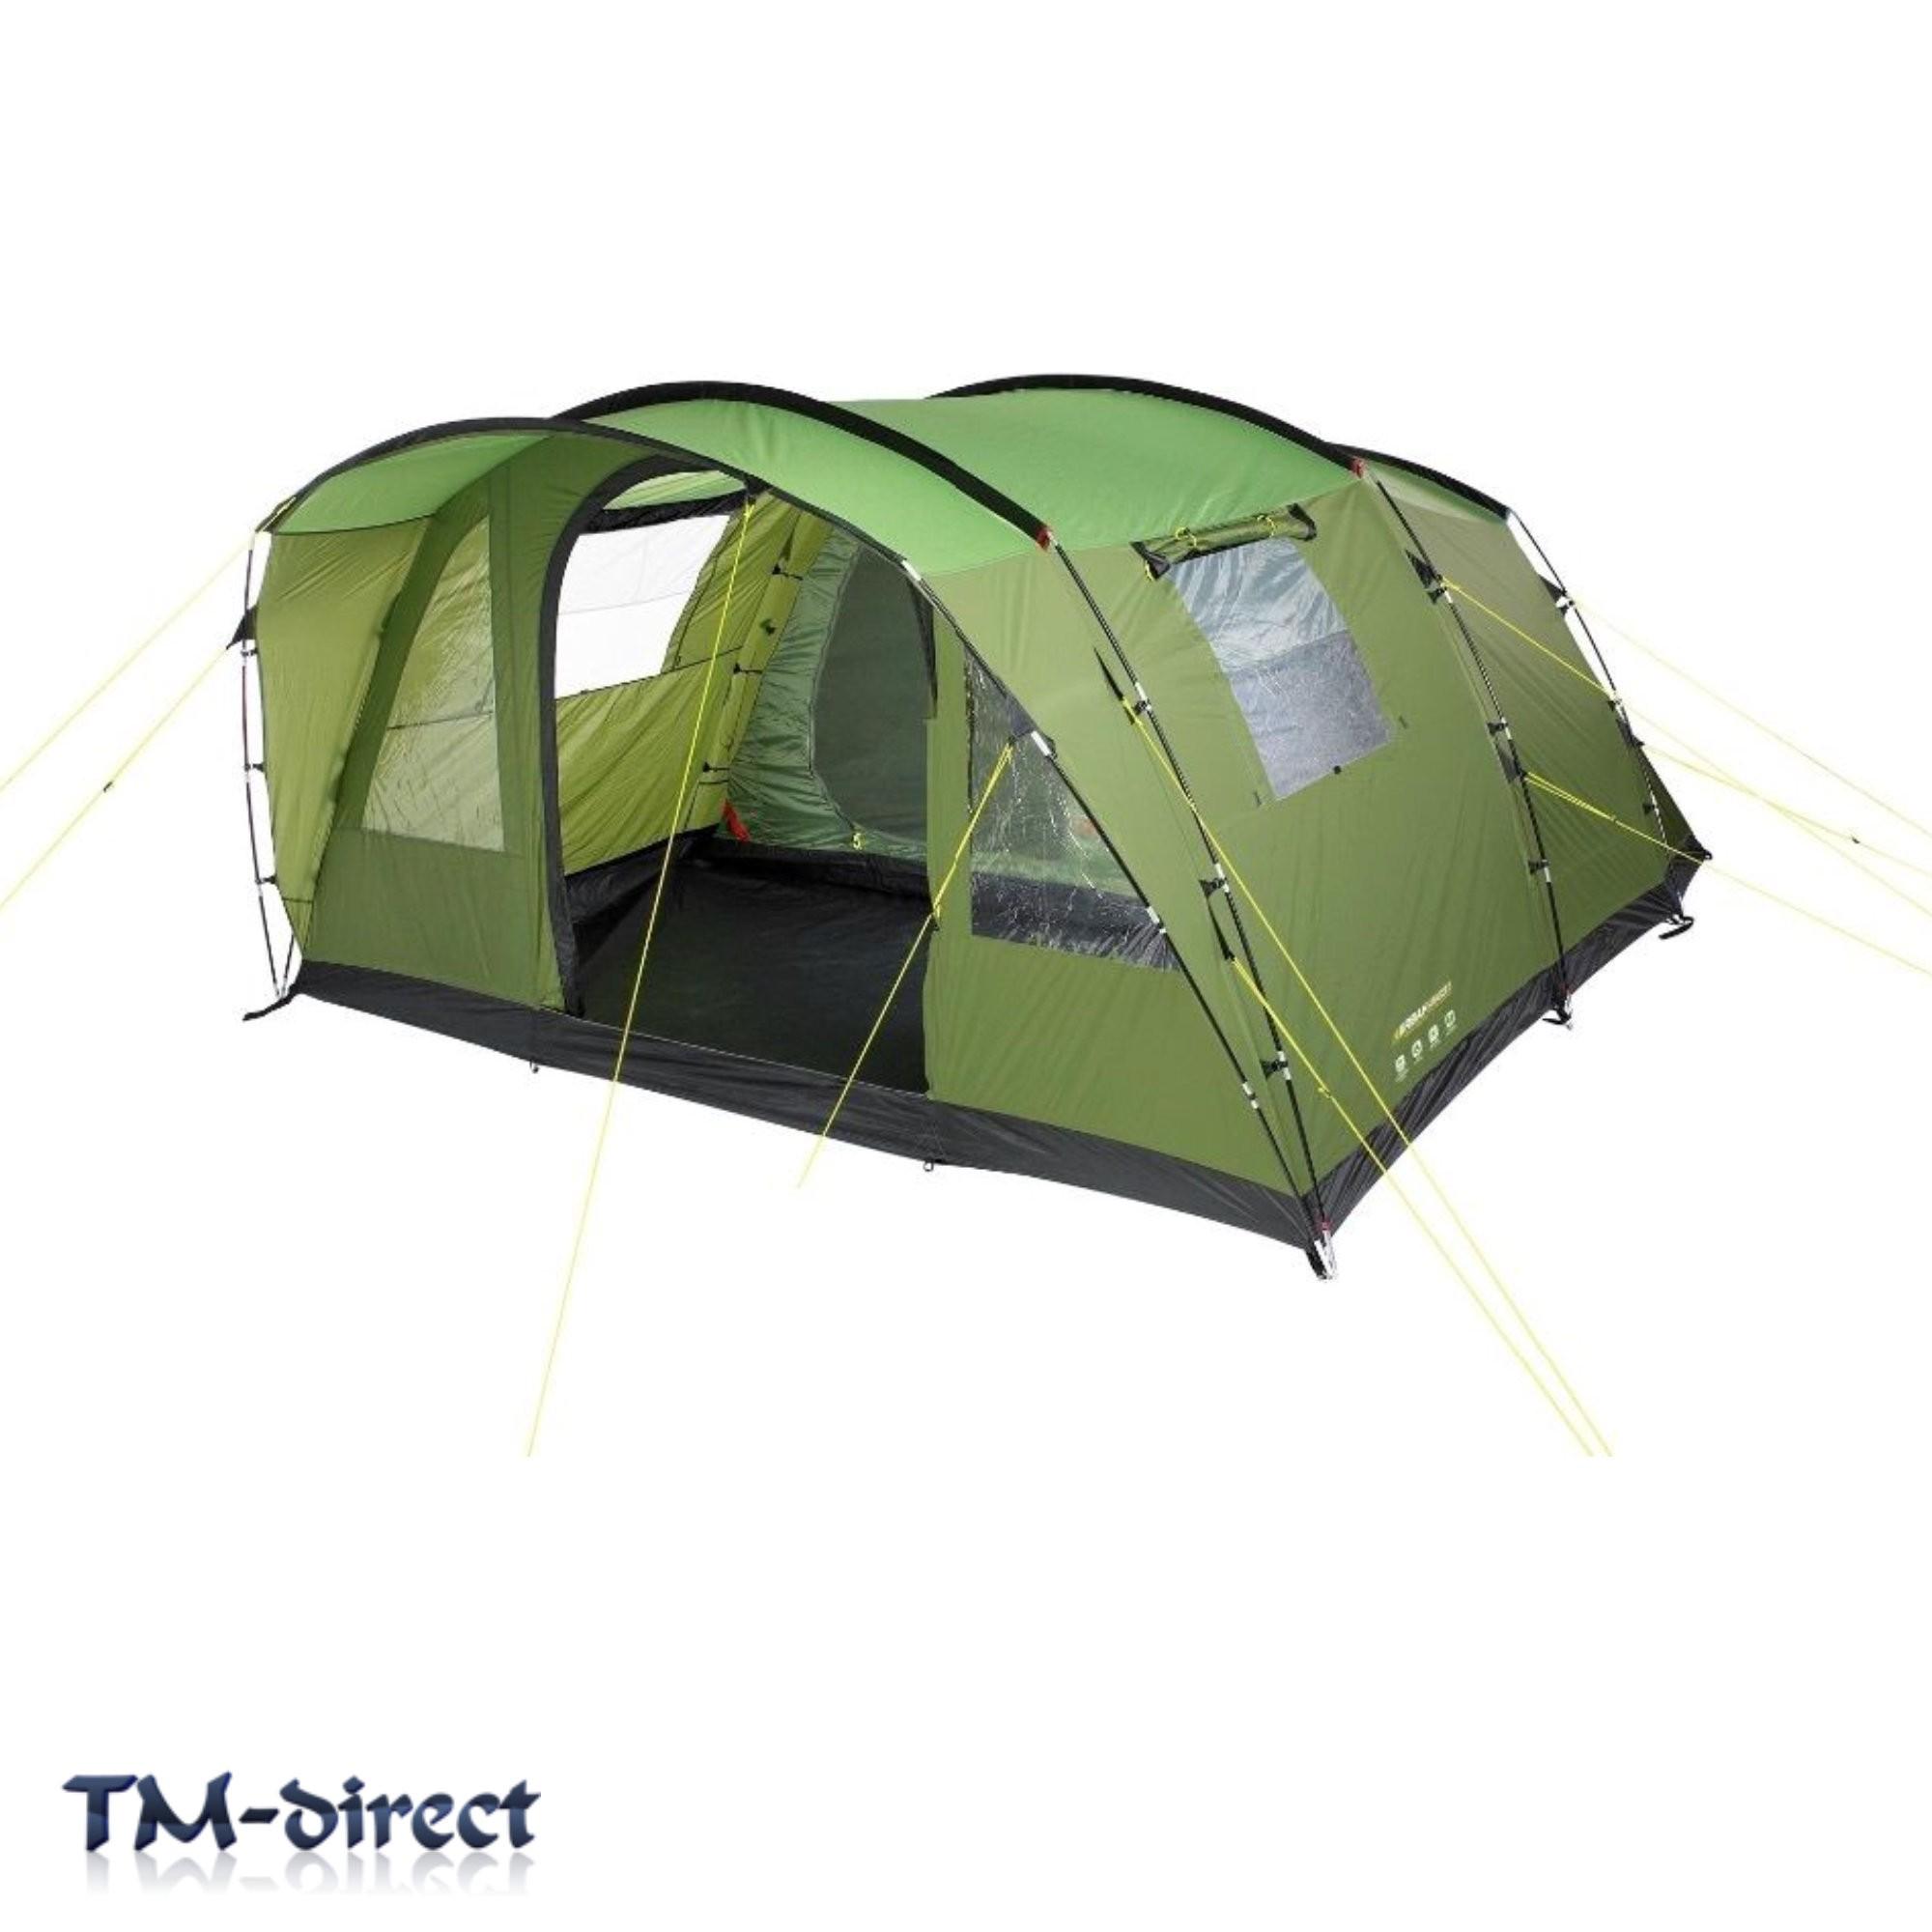 Urban Escape Atago 5 Person Berth Tent Green Tunnel 2 Sleeping Areas Double Skin ...  sc 1 st  TM-direct LTD & Urban Escape Atago 5 Person Berth Tent Green Tunnel 2 Area Double Skin